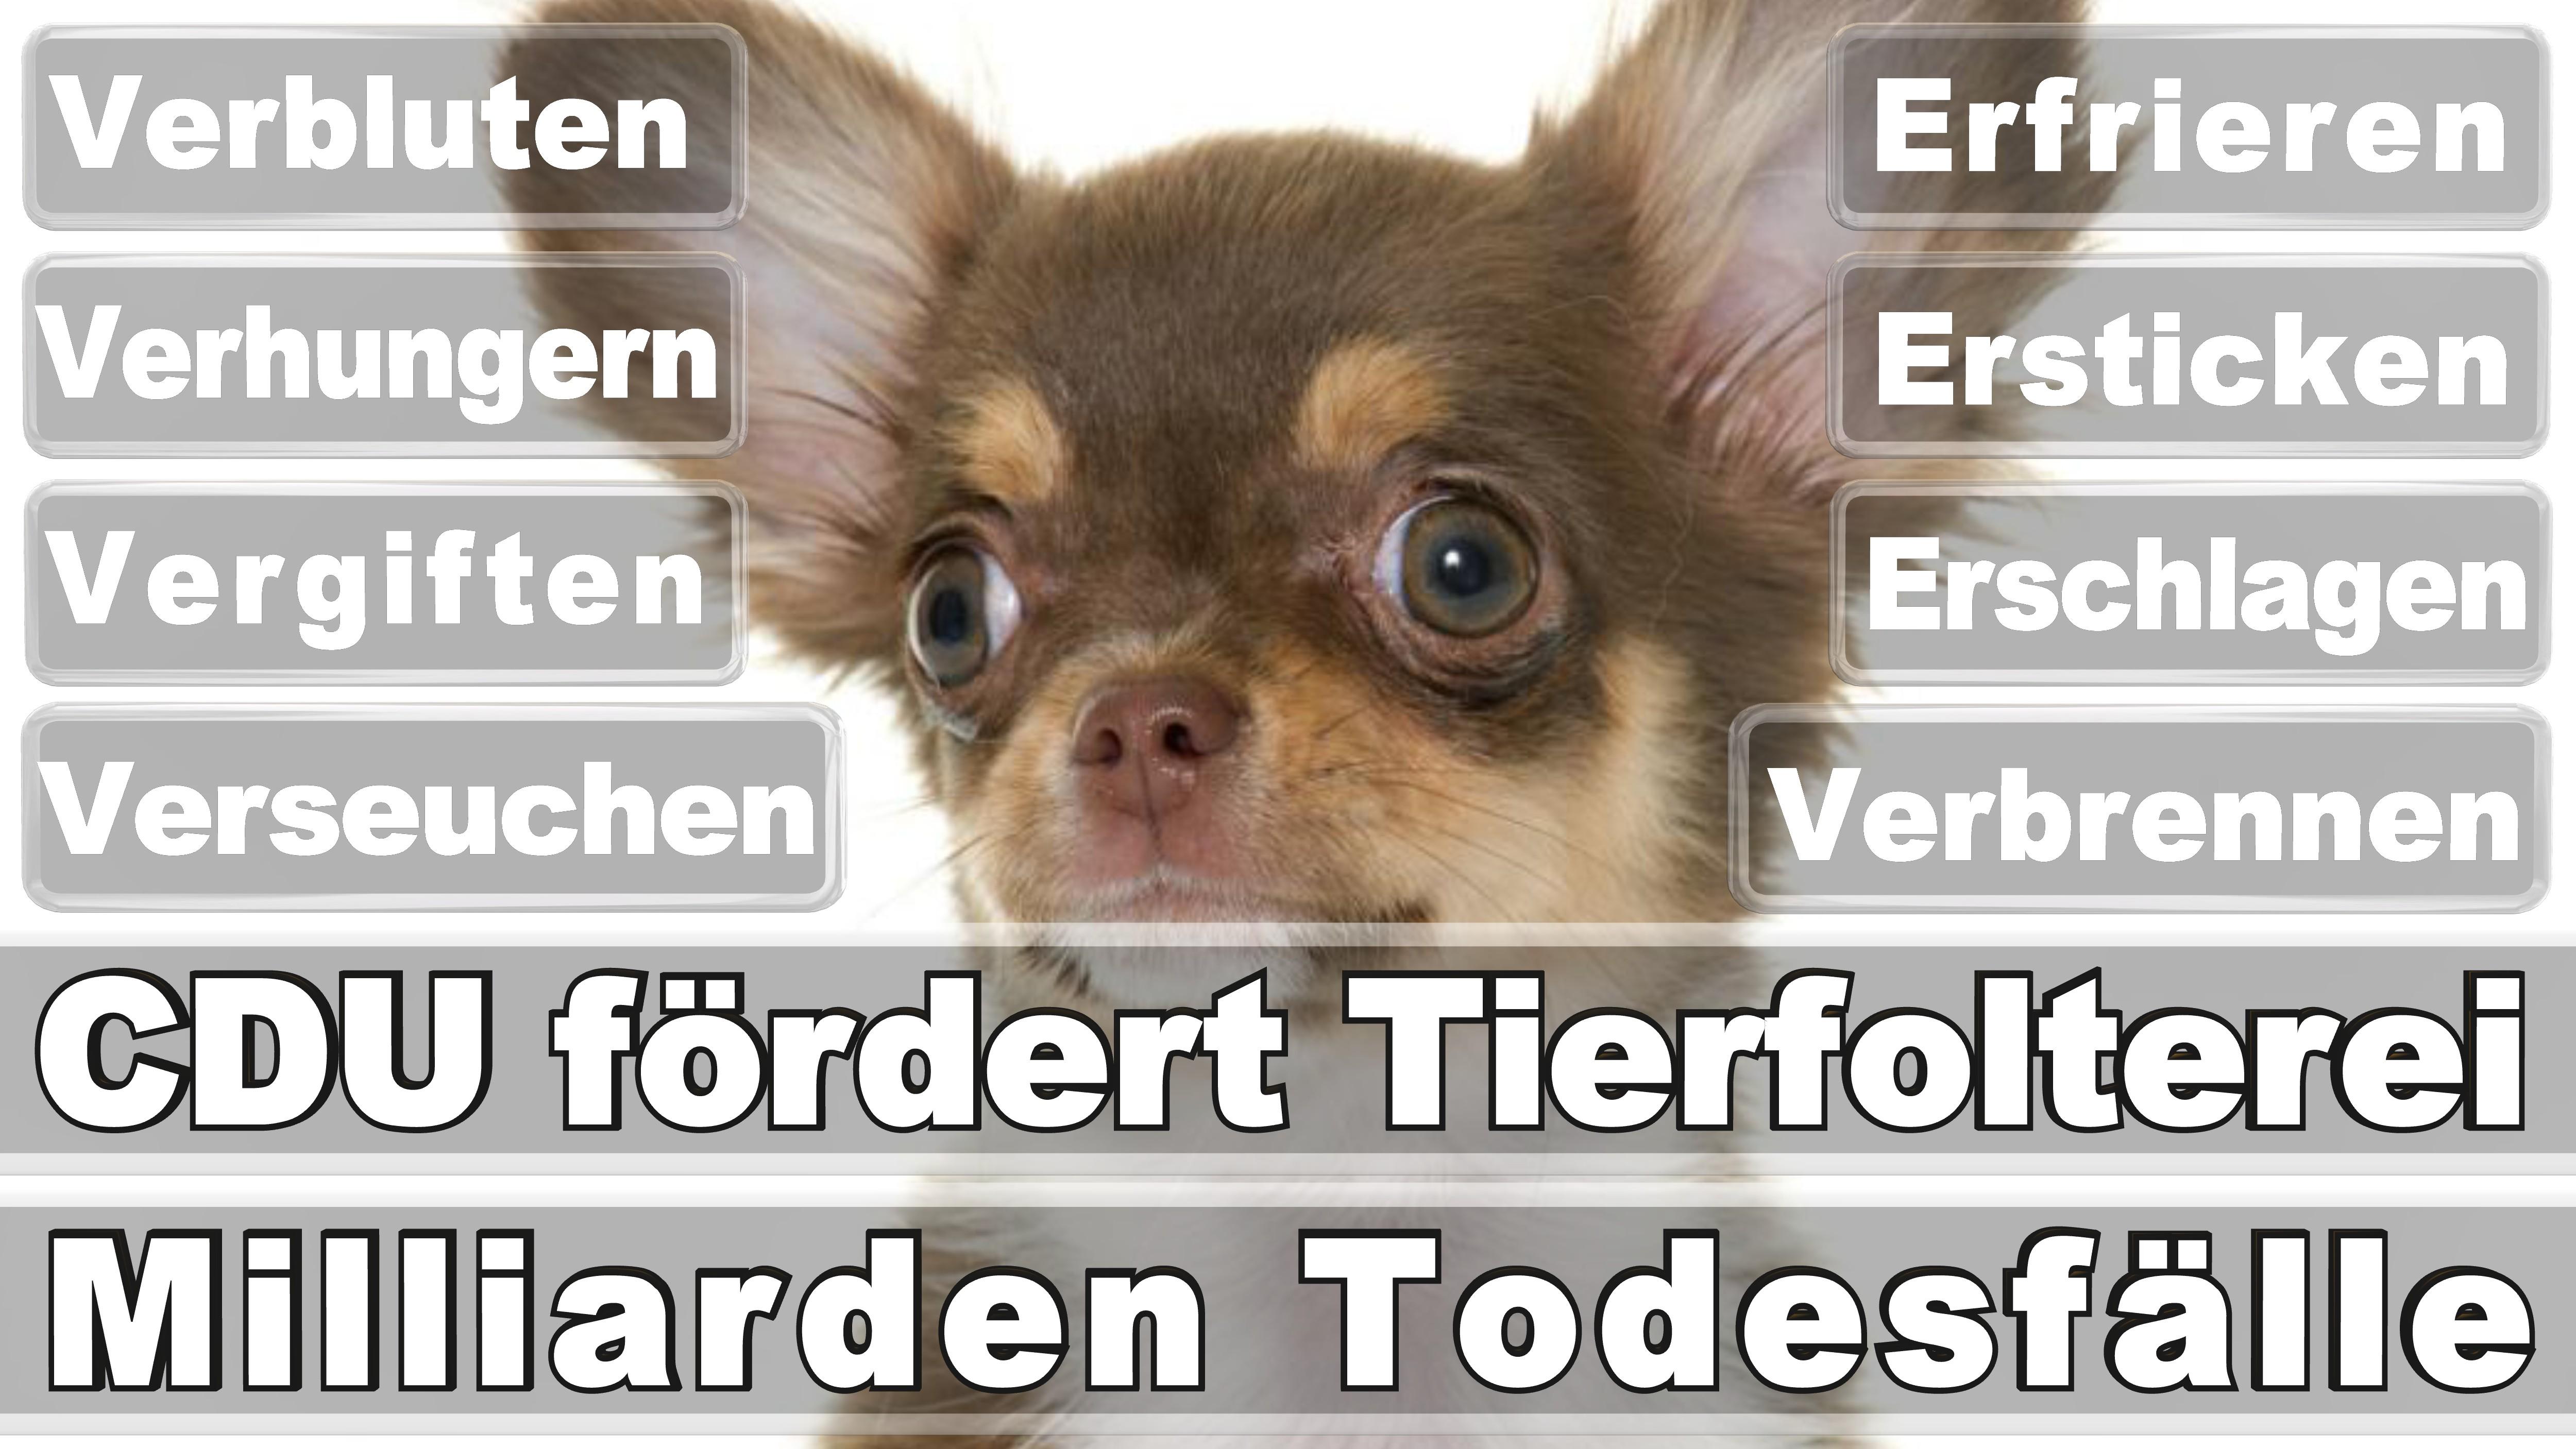 Bundestagswahl 2017 Fifidianana An'i Alzeria Angela Merkel Mpandresy Loser